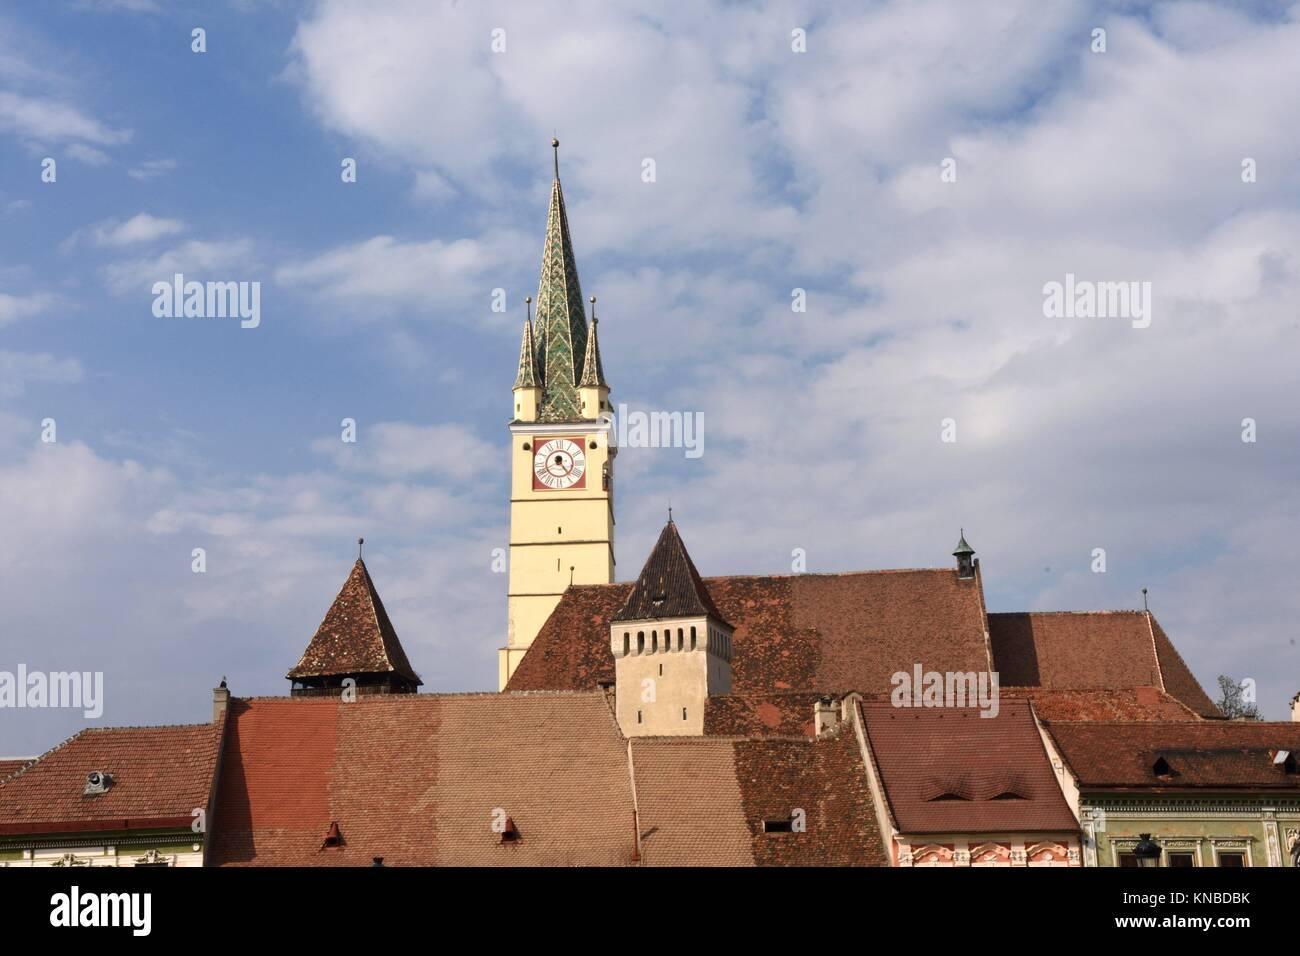 The Fortified Saxon Church of Medias,Transylvania, Romania. - Stock Image